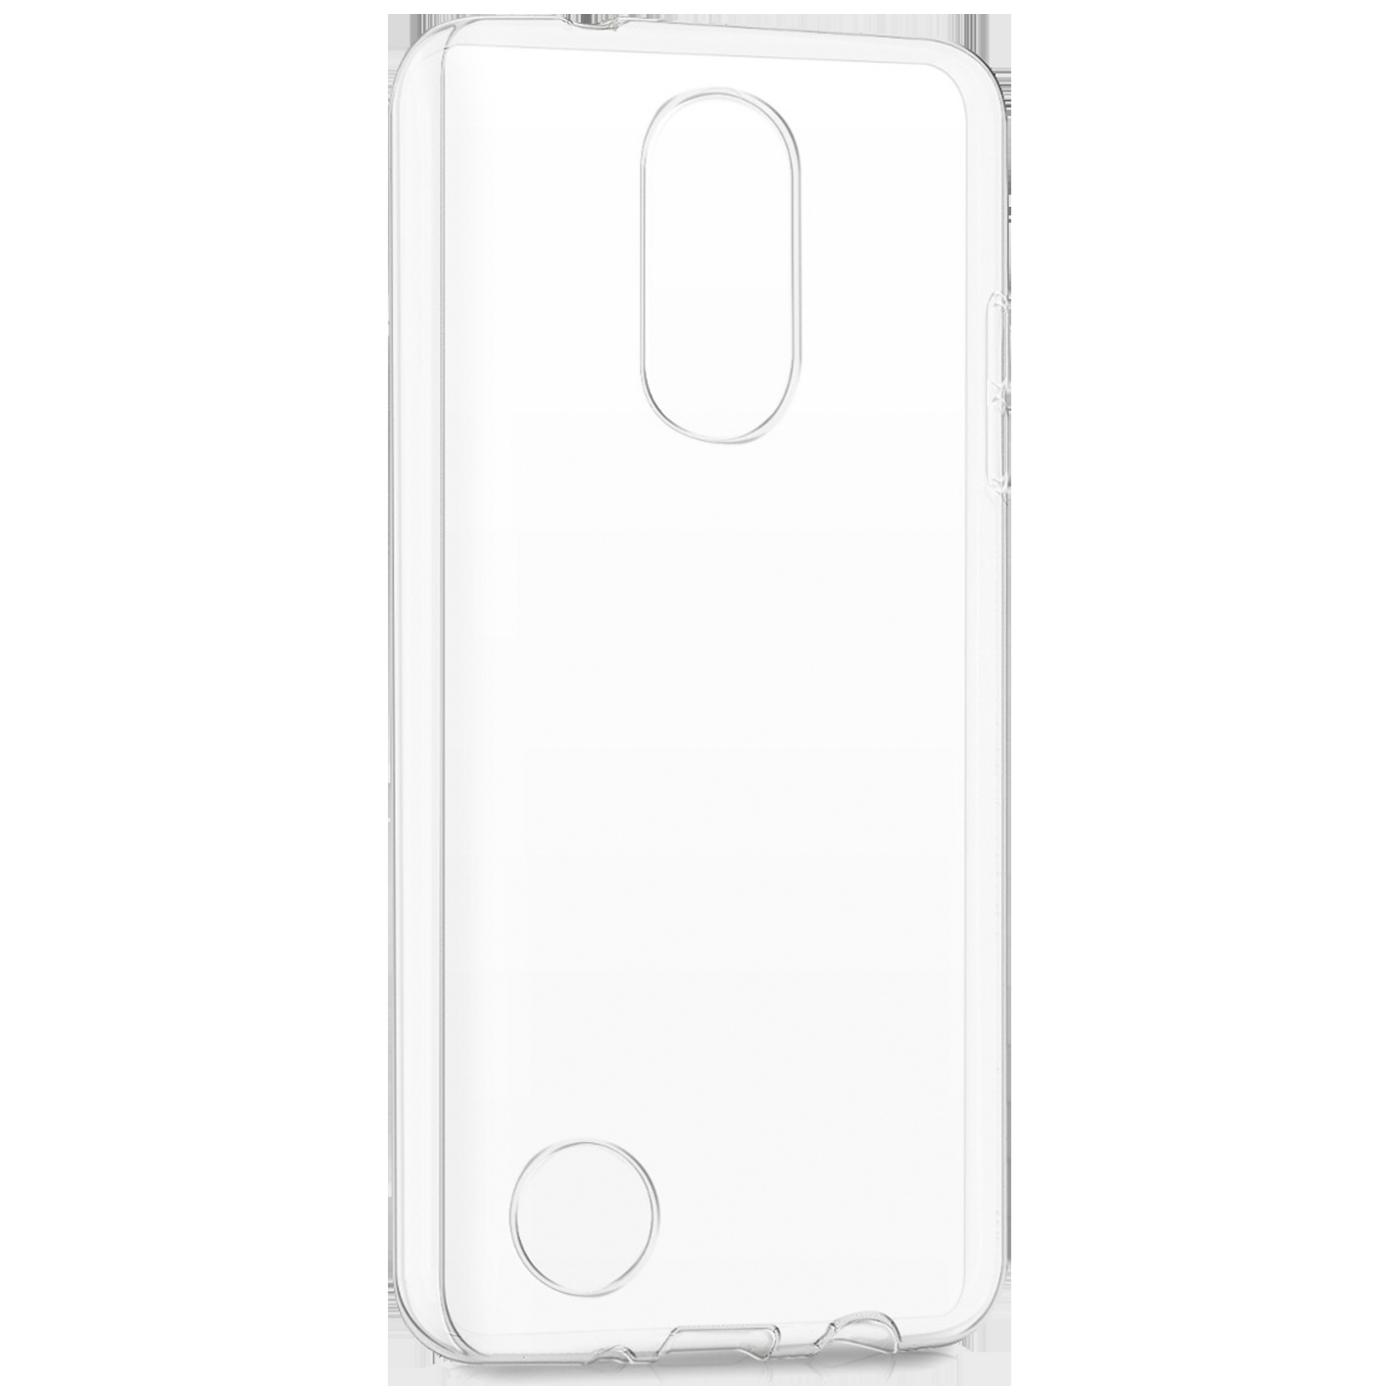 Futrola za mobitel LG K8, silikonska providna